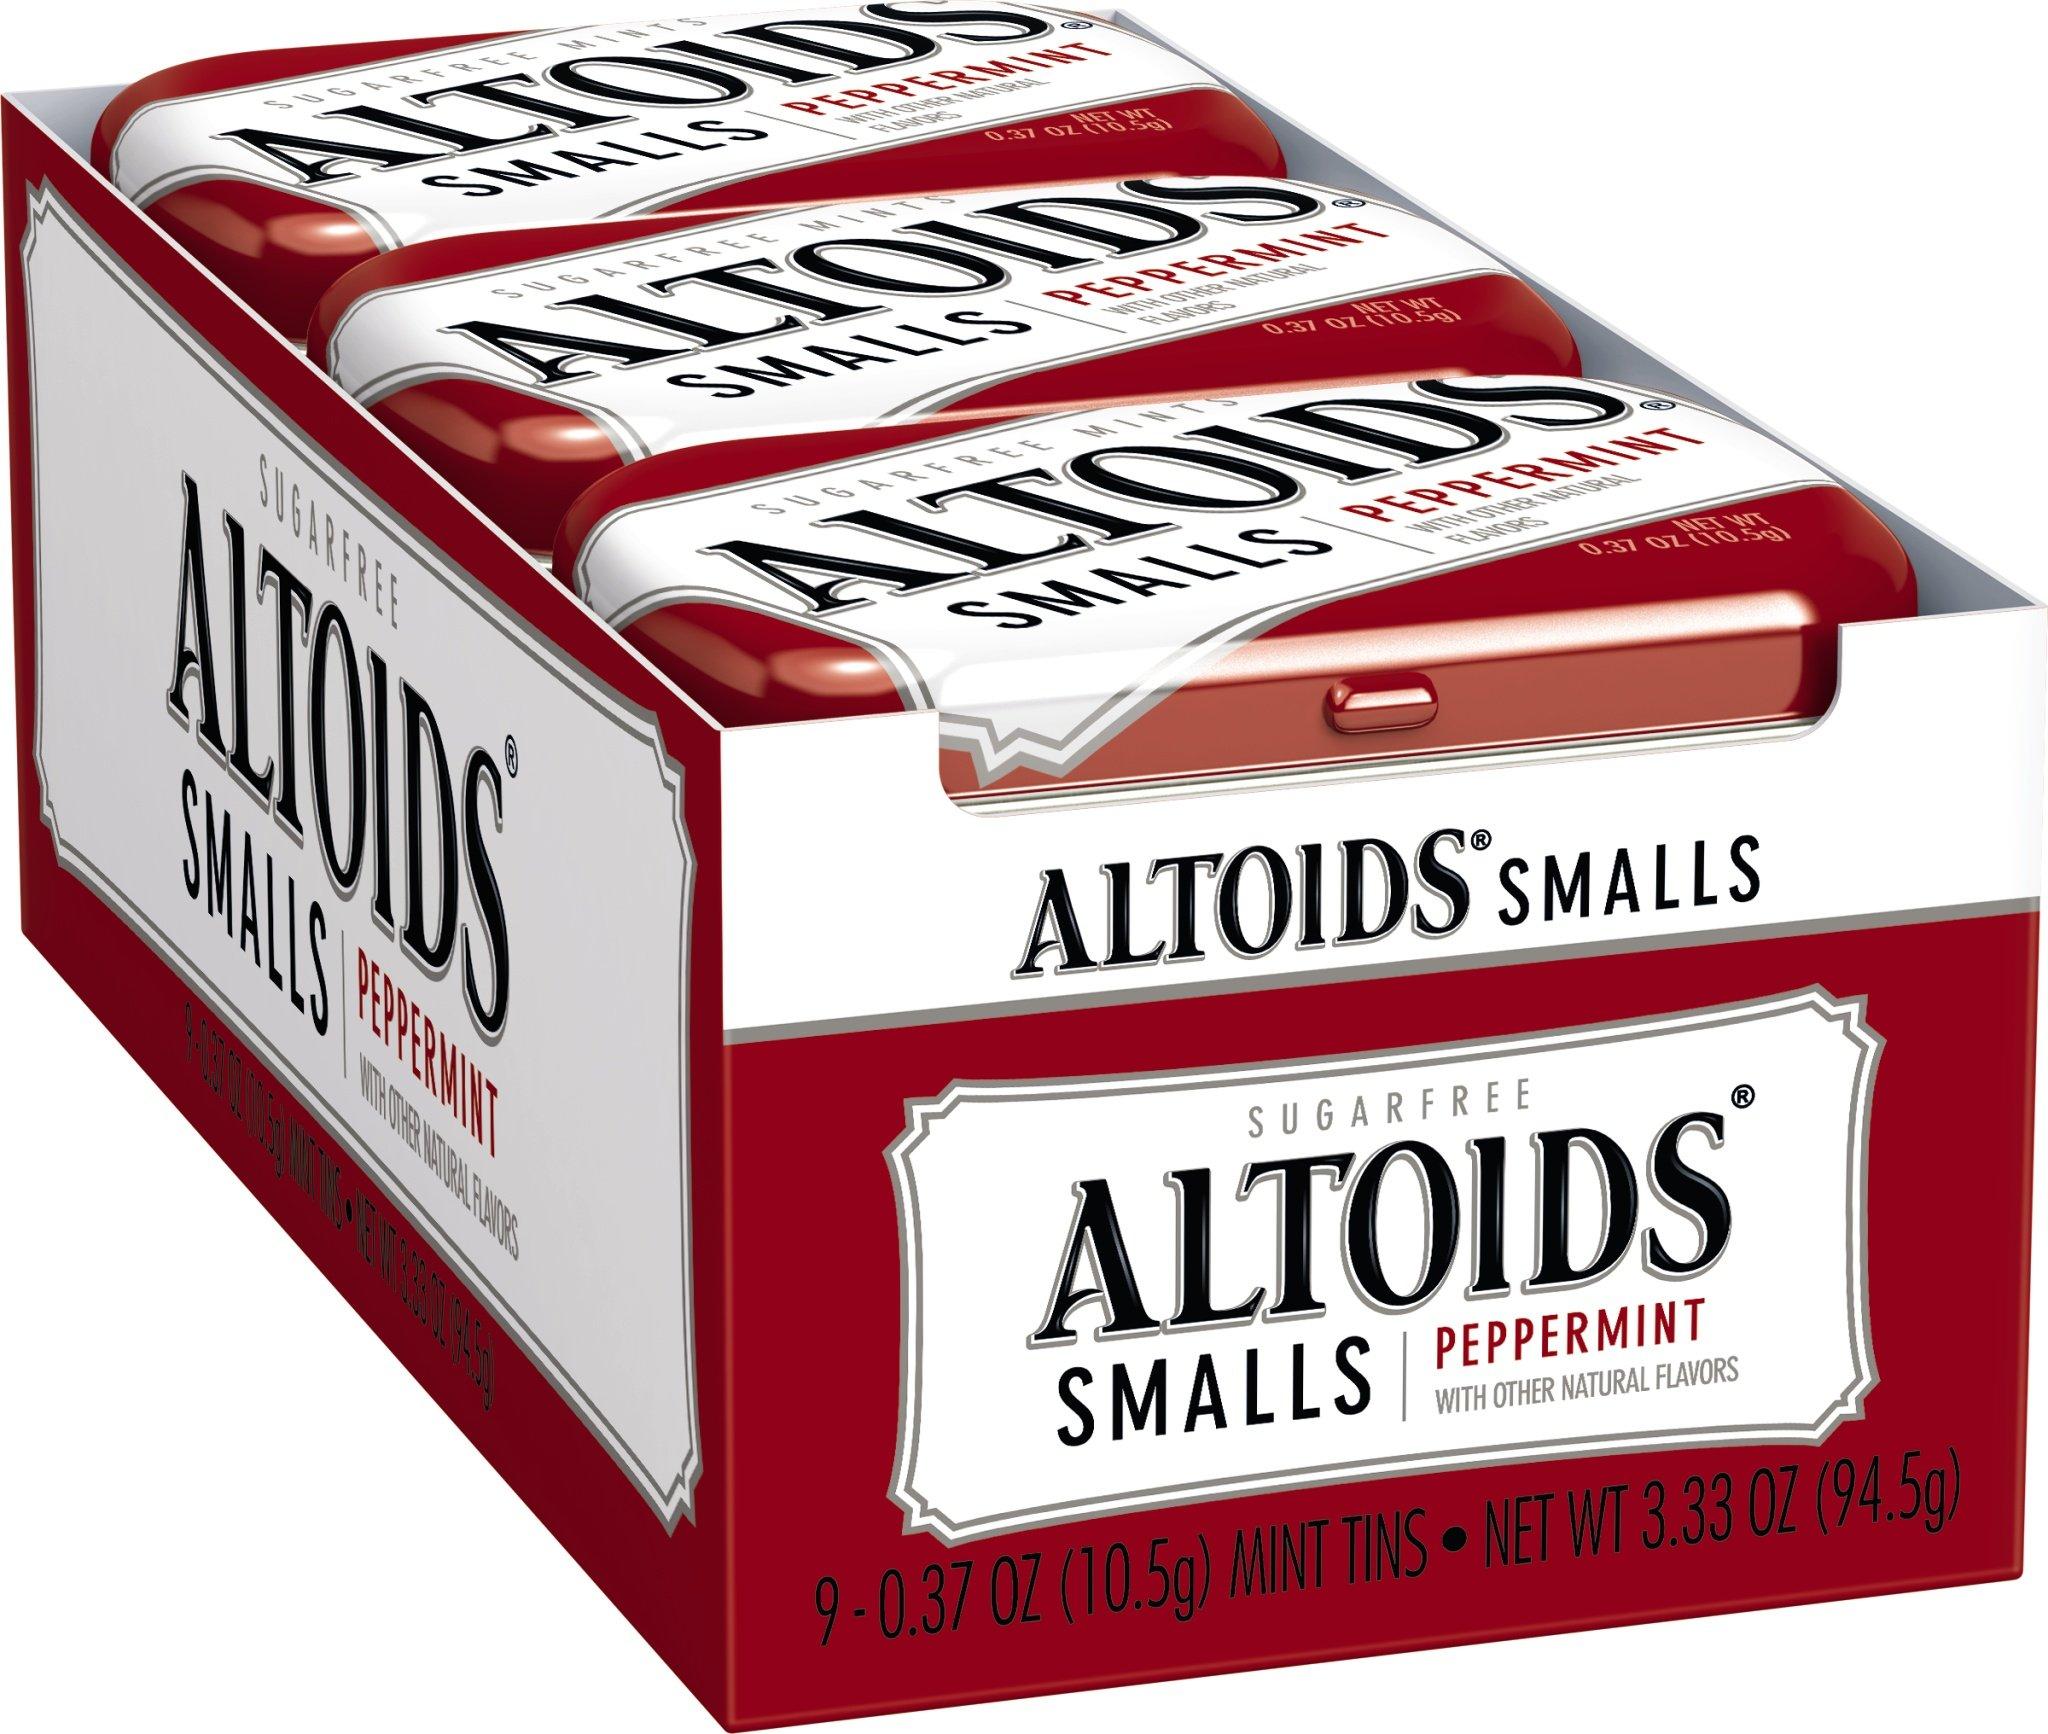 Altoids Smalls Mints, Peppermint, 0.37 Ounce (2 Packs of 9)